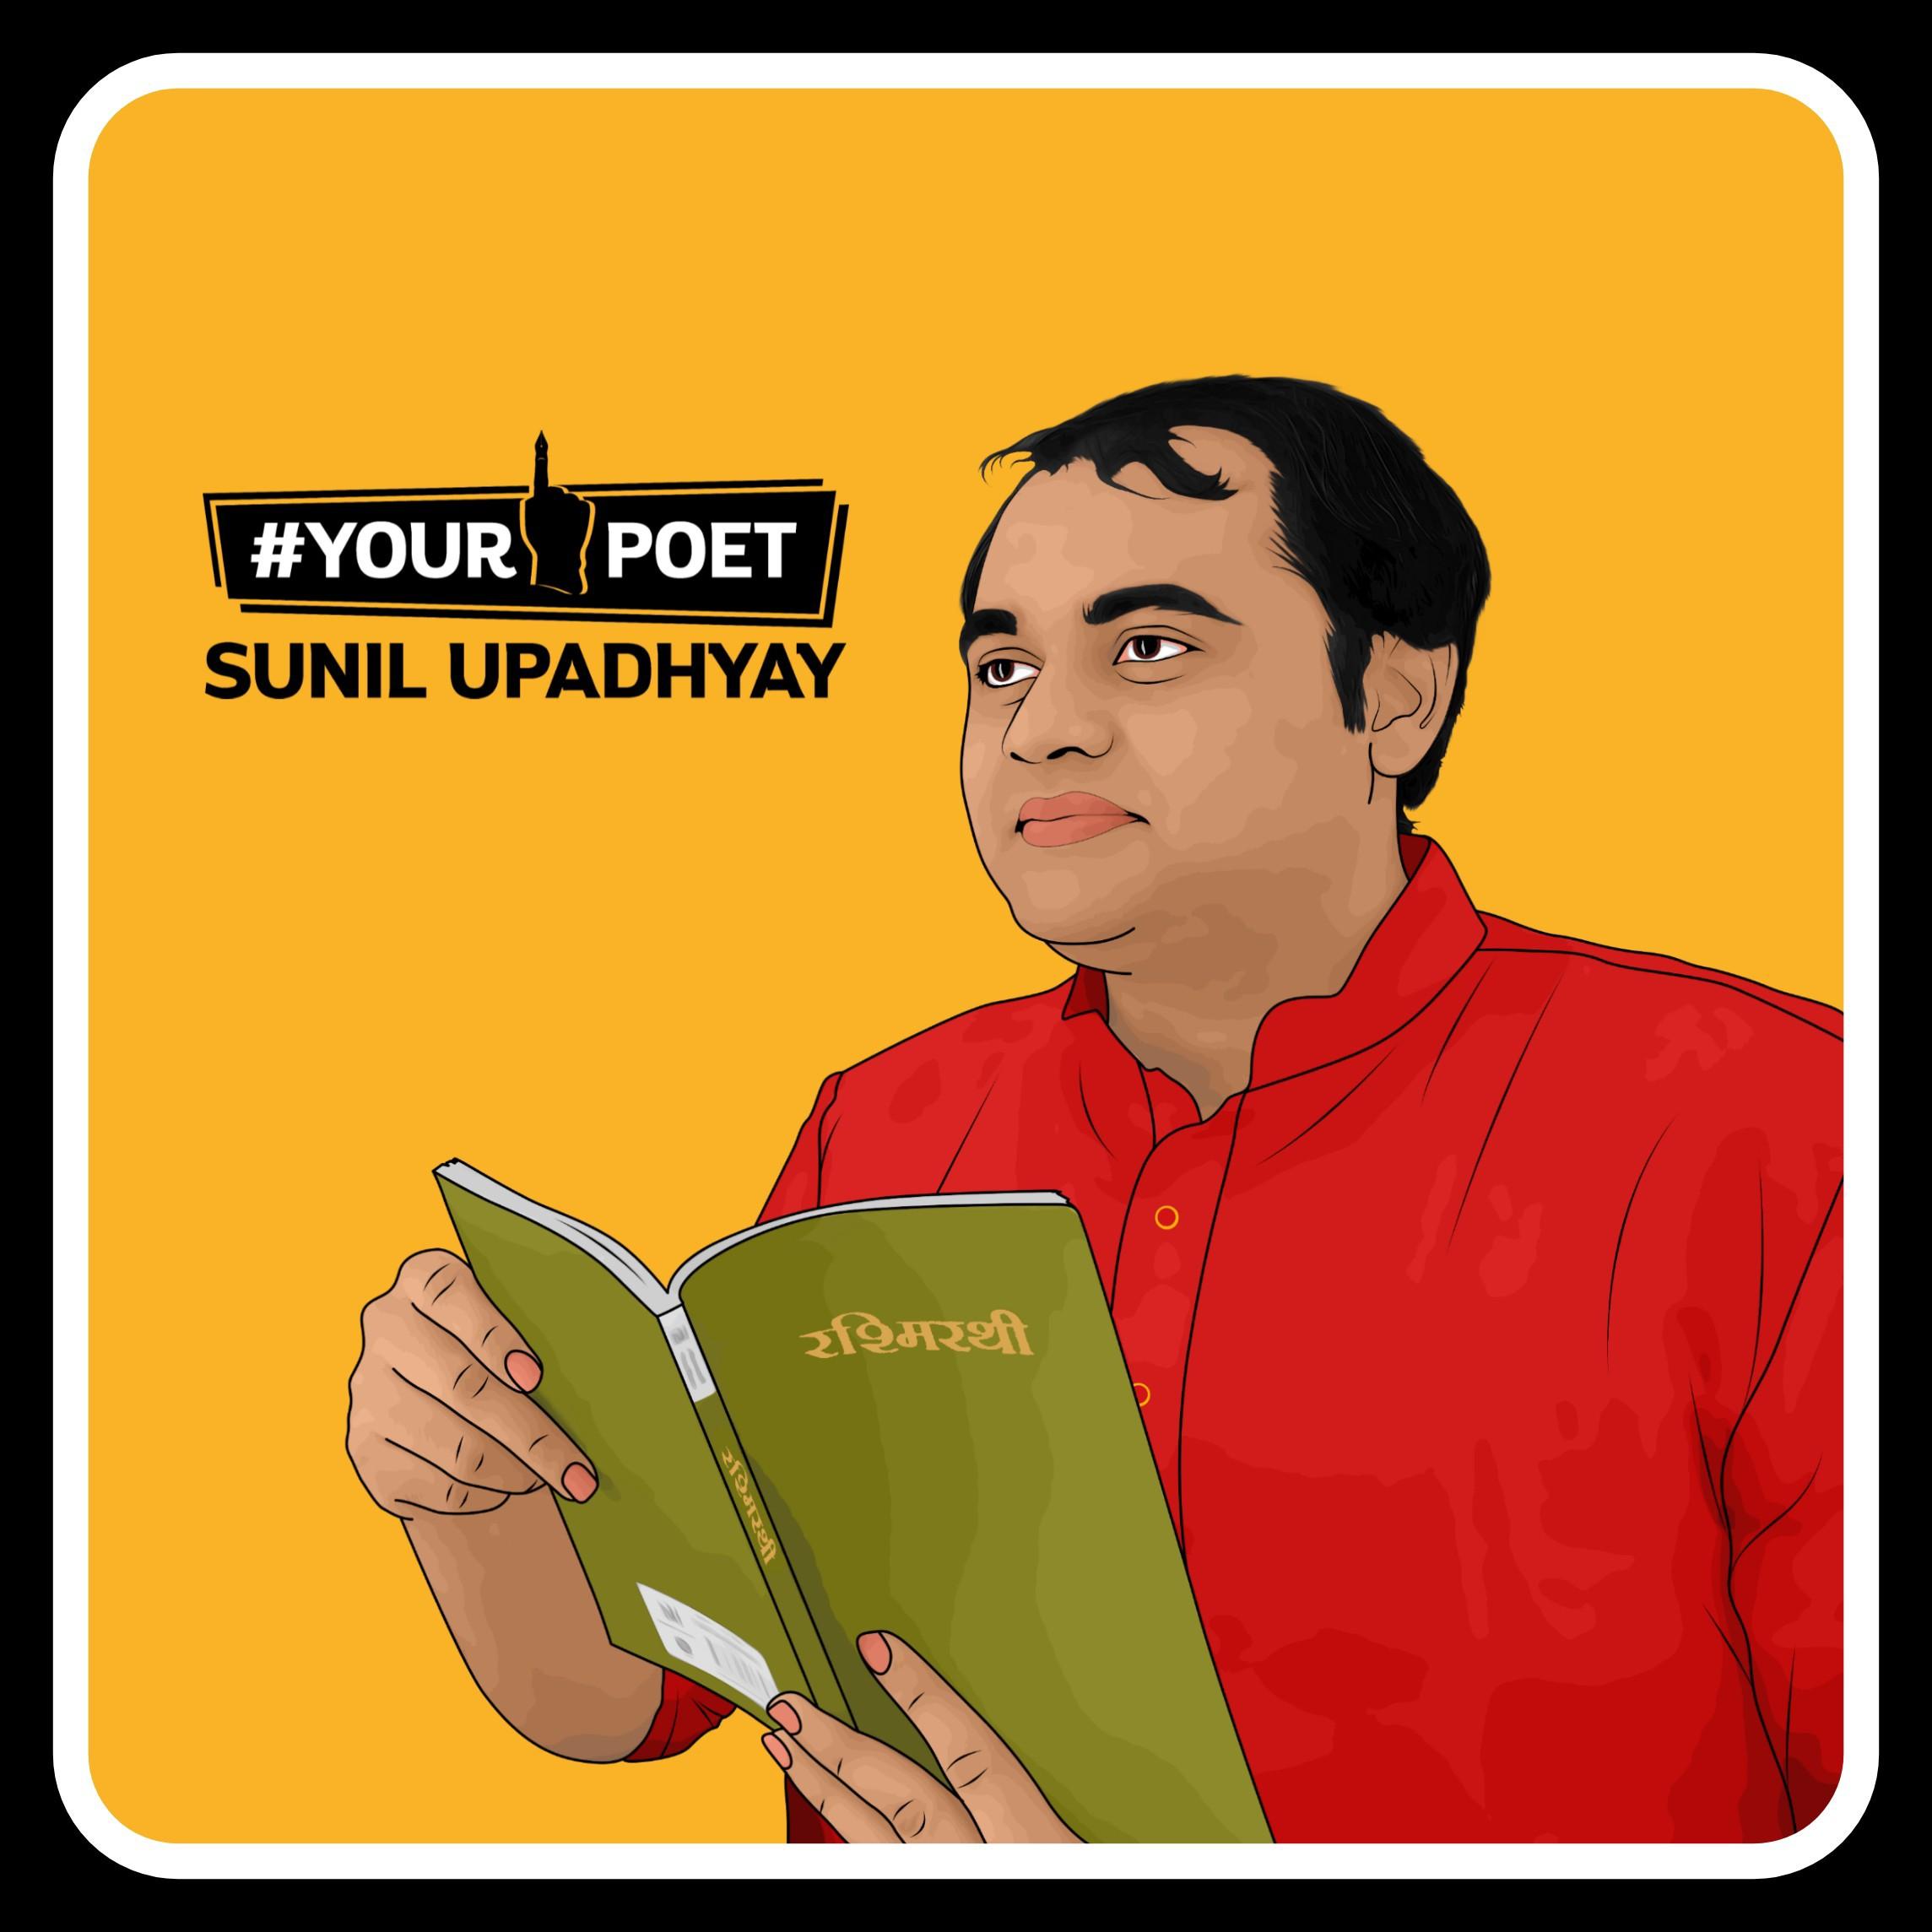 Sunil Upadhyay